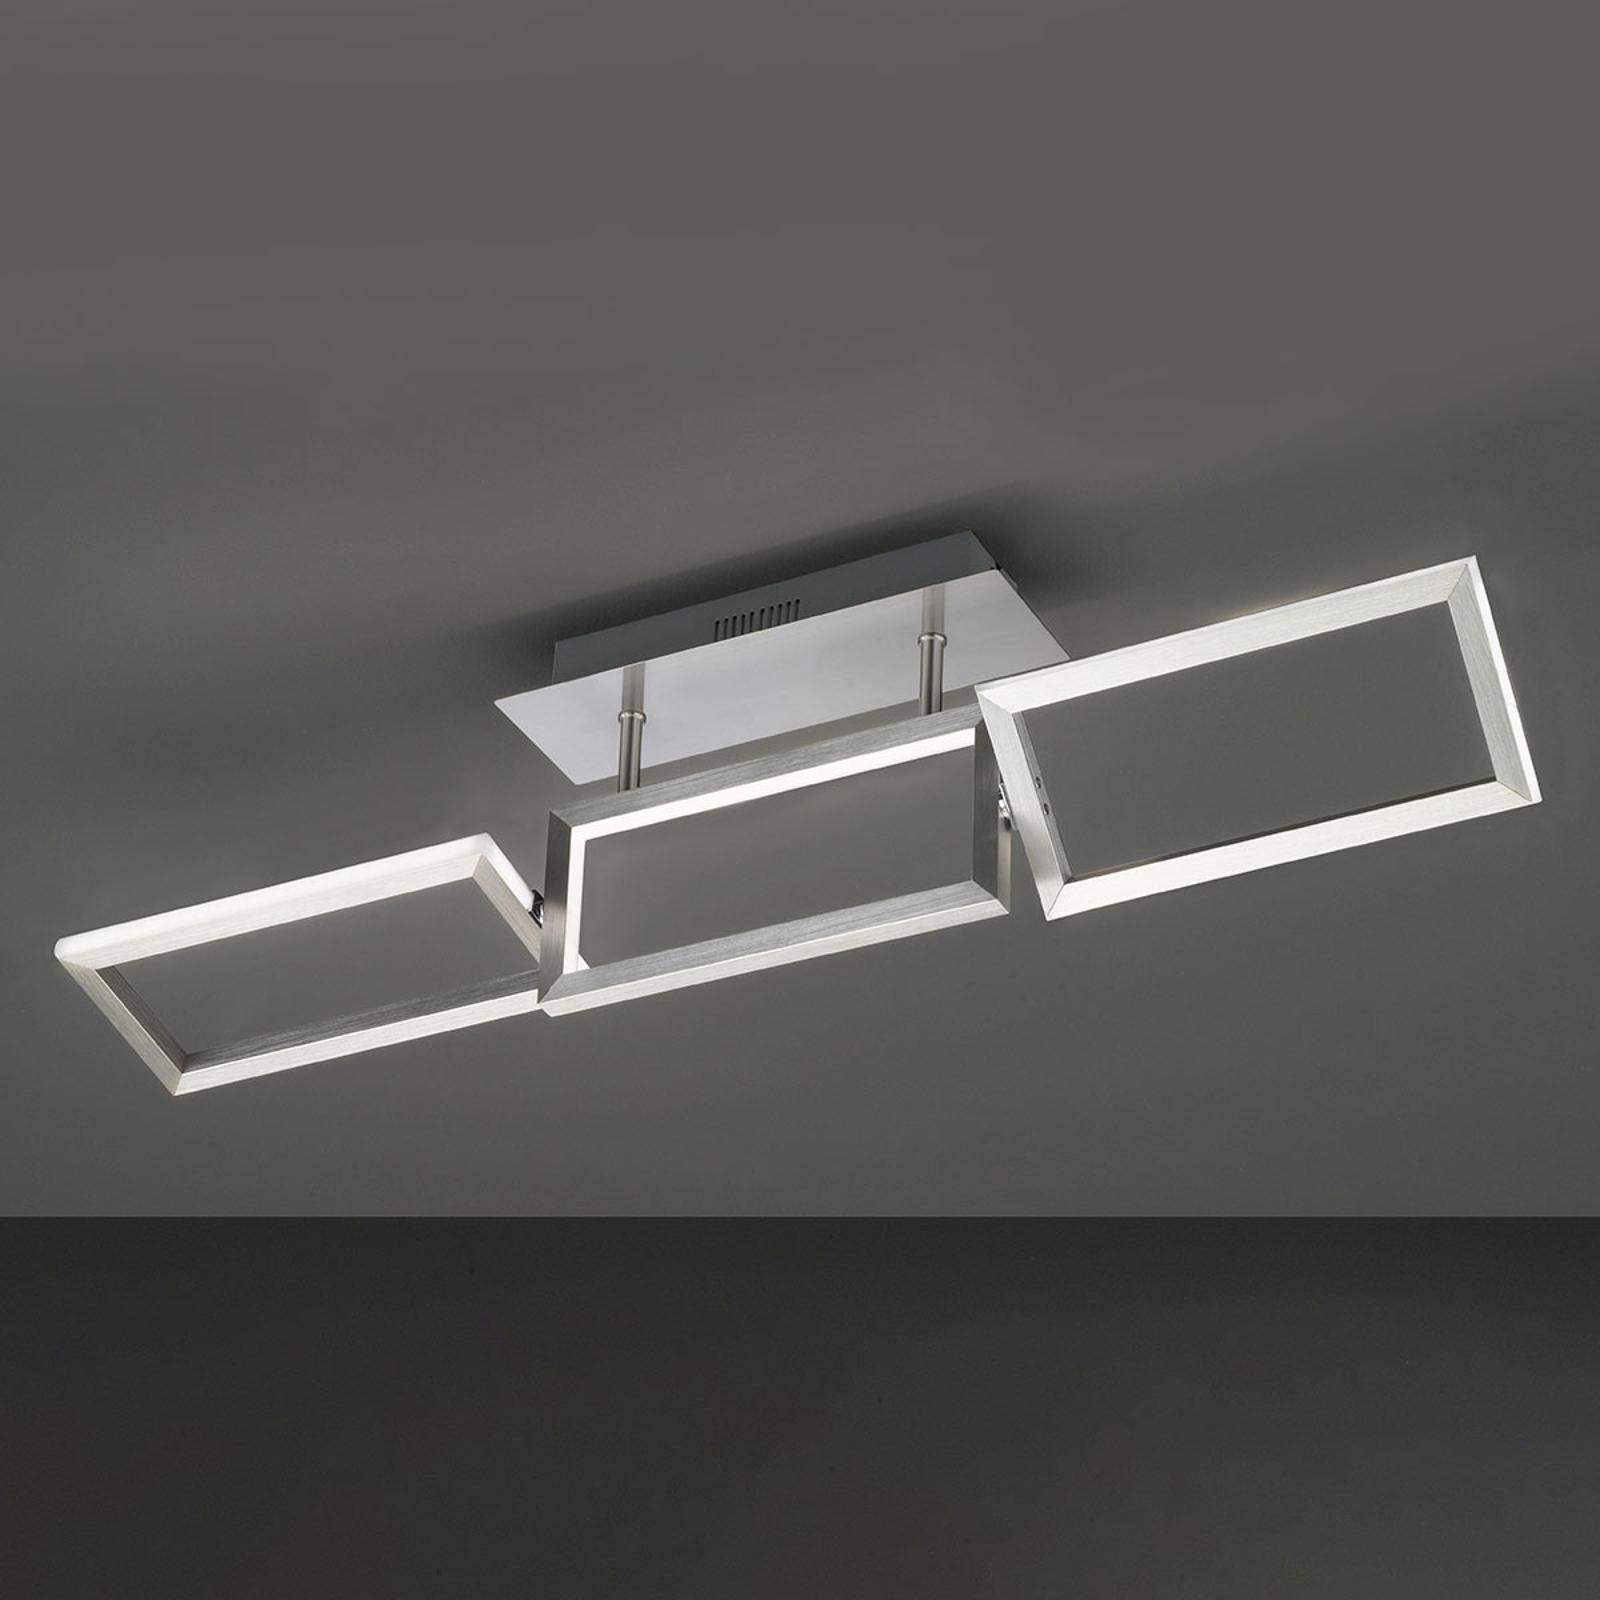 LED-taklampa Skip, justerbar, längd 81,5 cm